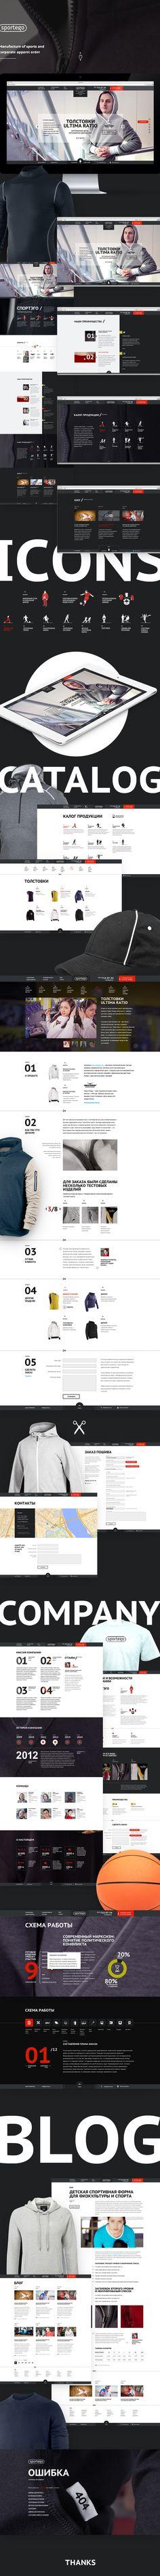 Manufacture of sports and corporate apparel order Web Design Tools, Web Ui Design, Brochure Design, Tool Design, Layout Design, Graphic Design, Great Website Design, Modern Website, Ibiza